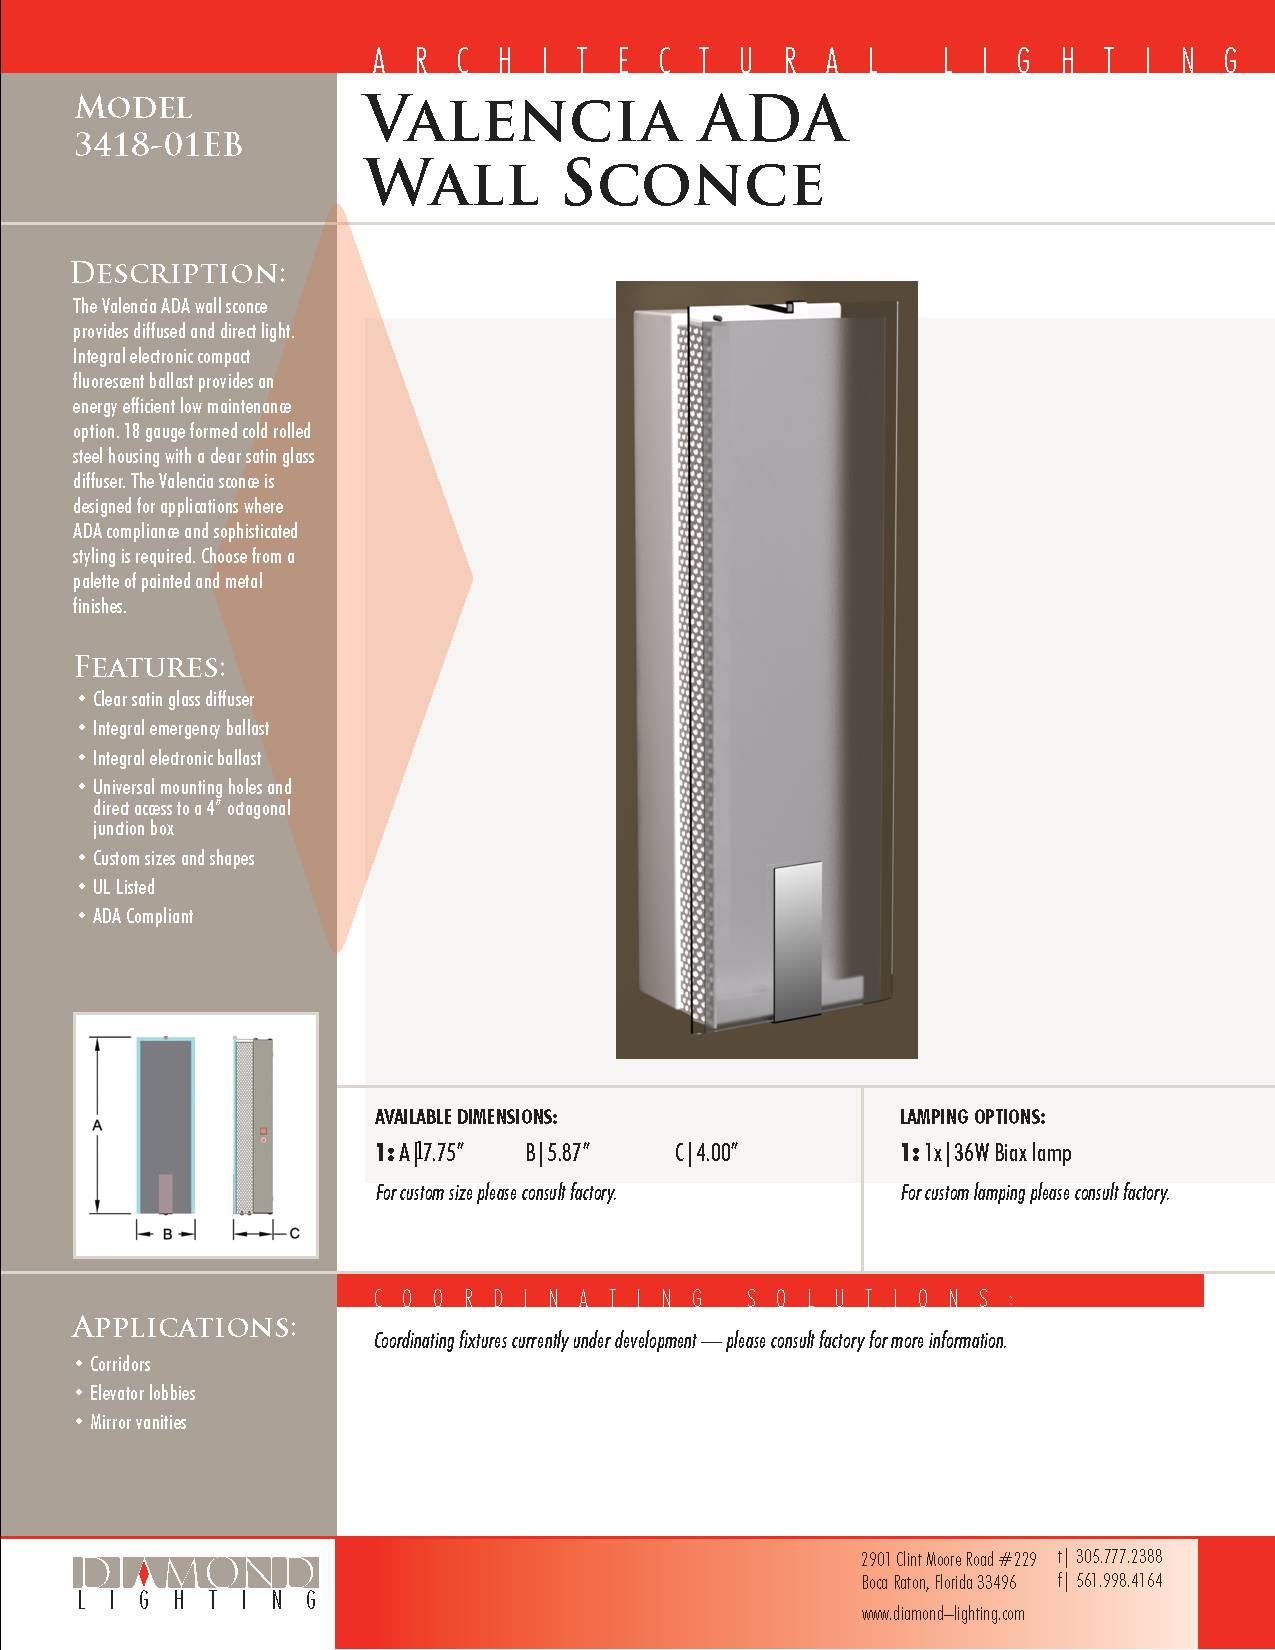 Diamond lighting ada wall sconces valencia ada wall sconce amipublicfo Choice Image